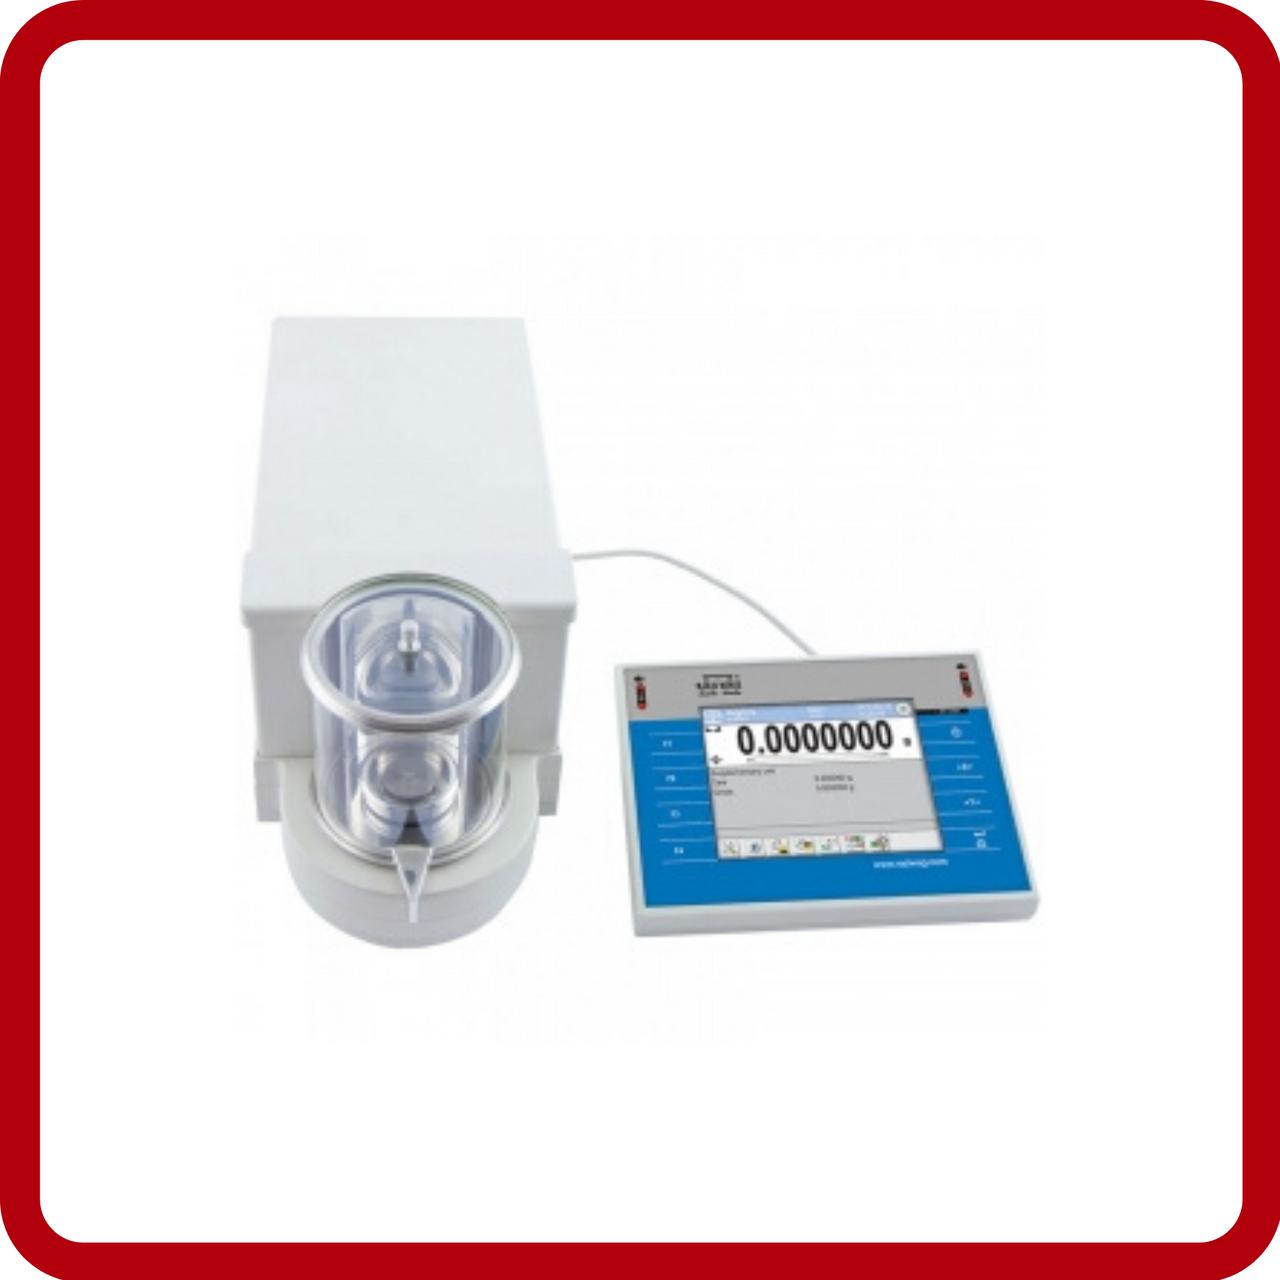 Ultra Micro Balances 0.1 μg